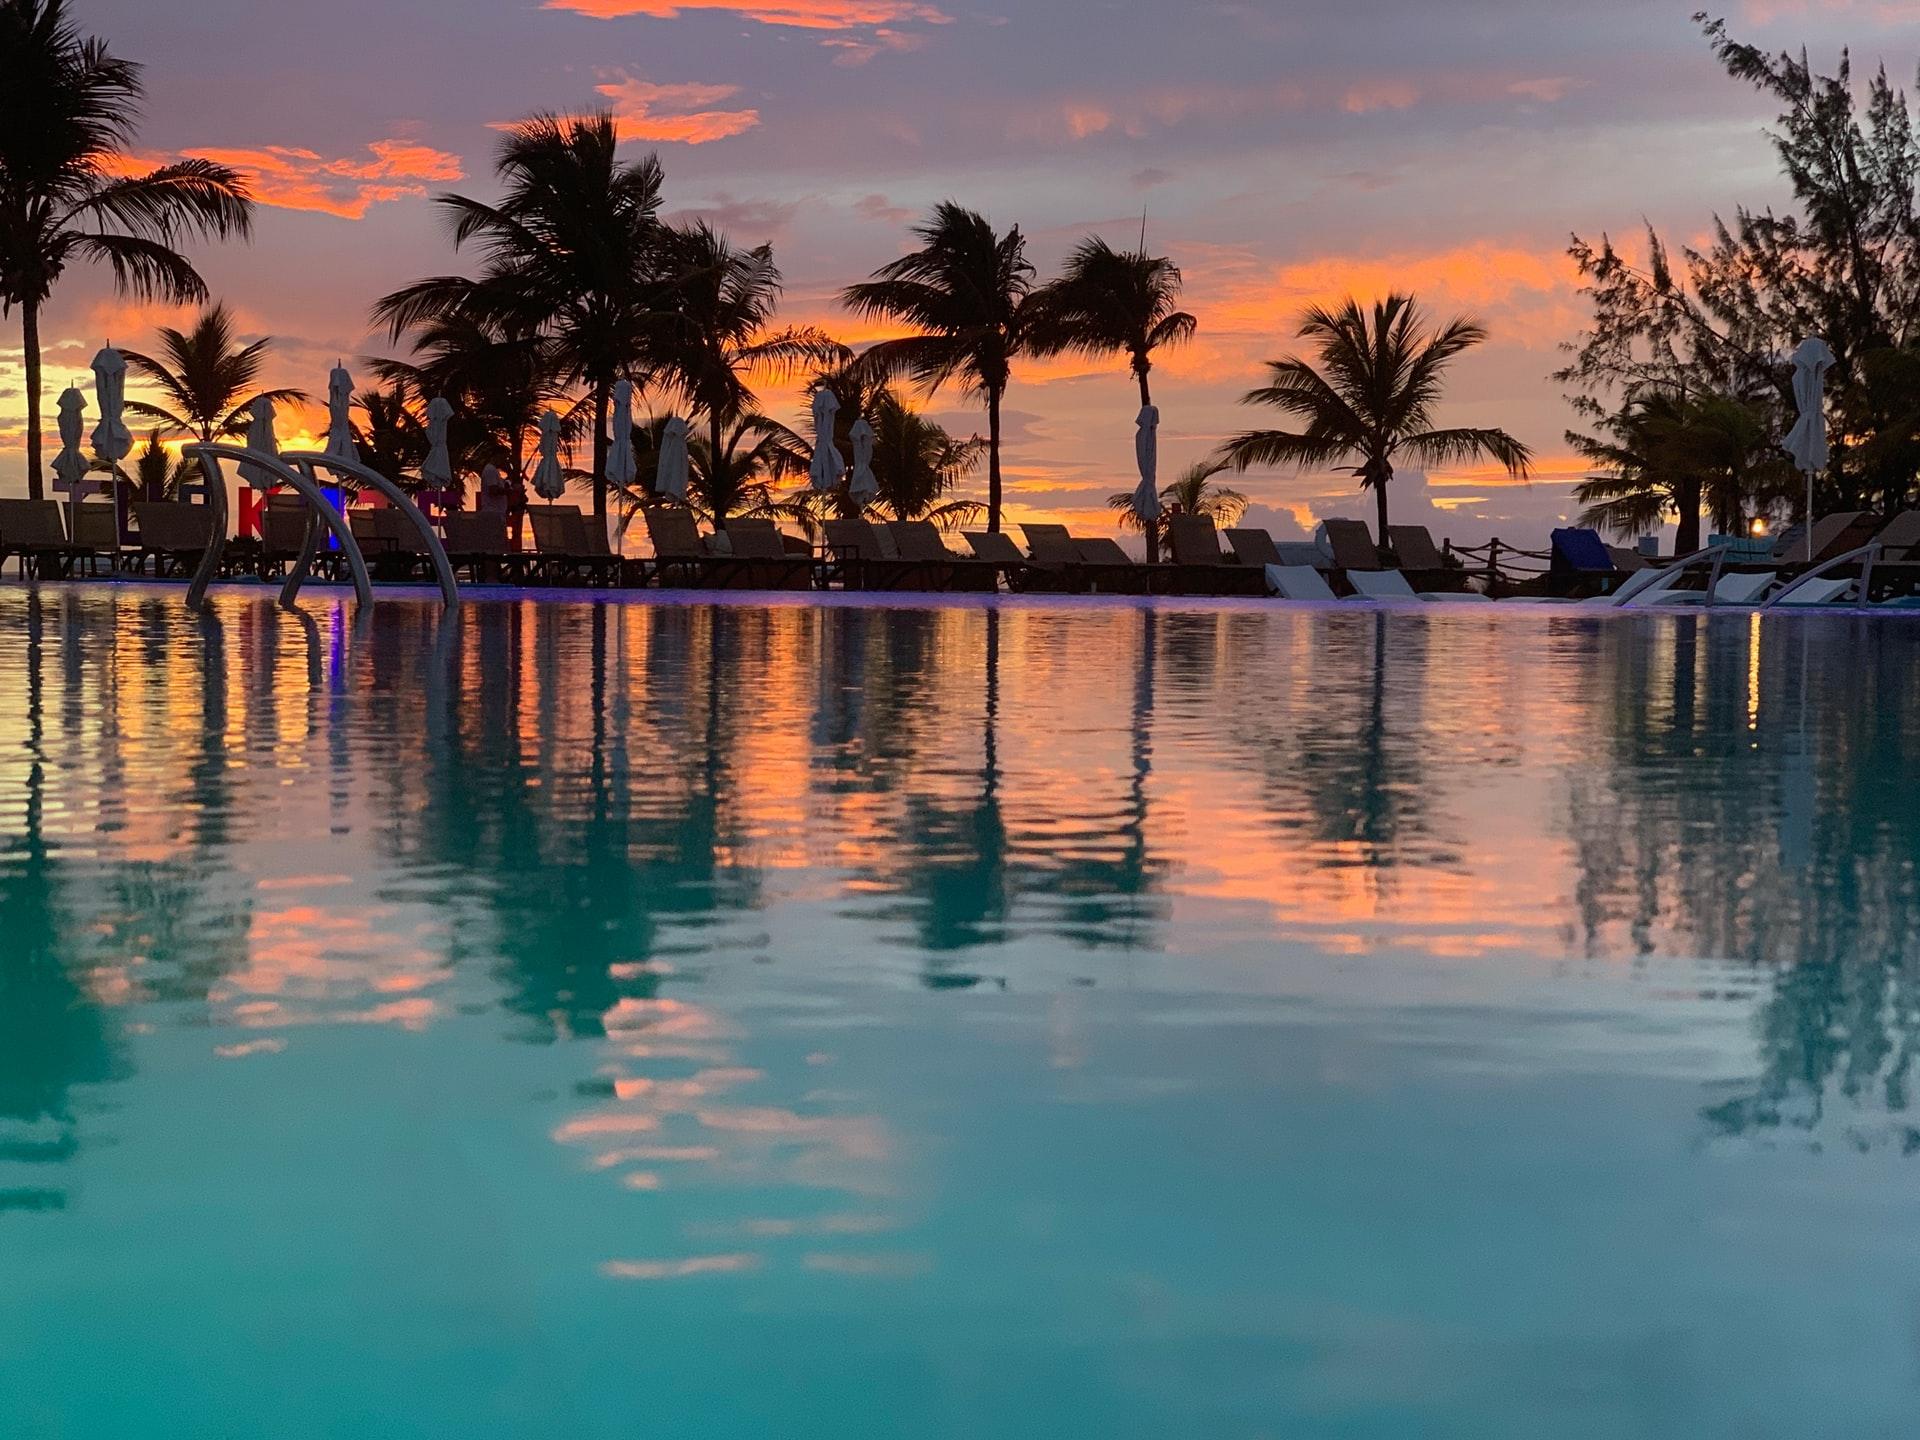 Il rebranding di Aeroviaggi: nasce Mangia's Sea View Resorts & Clubs